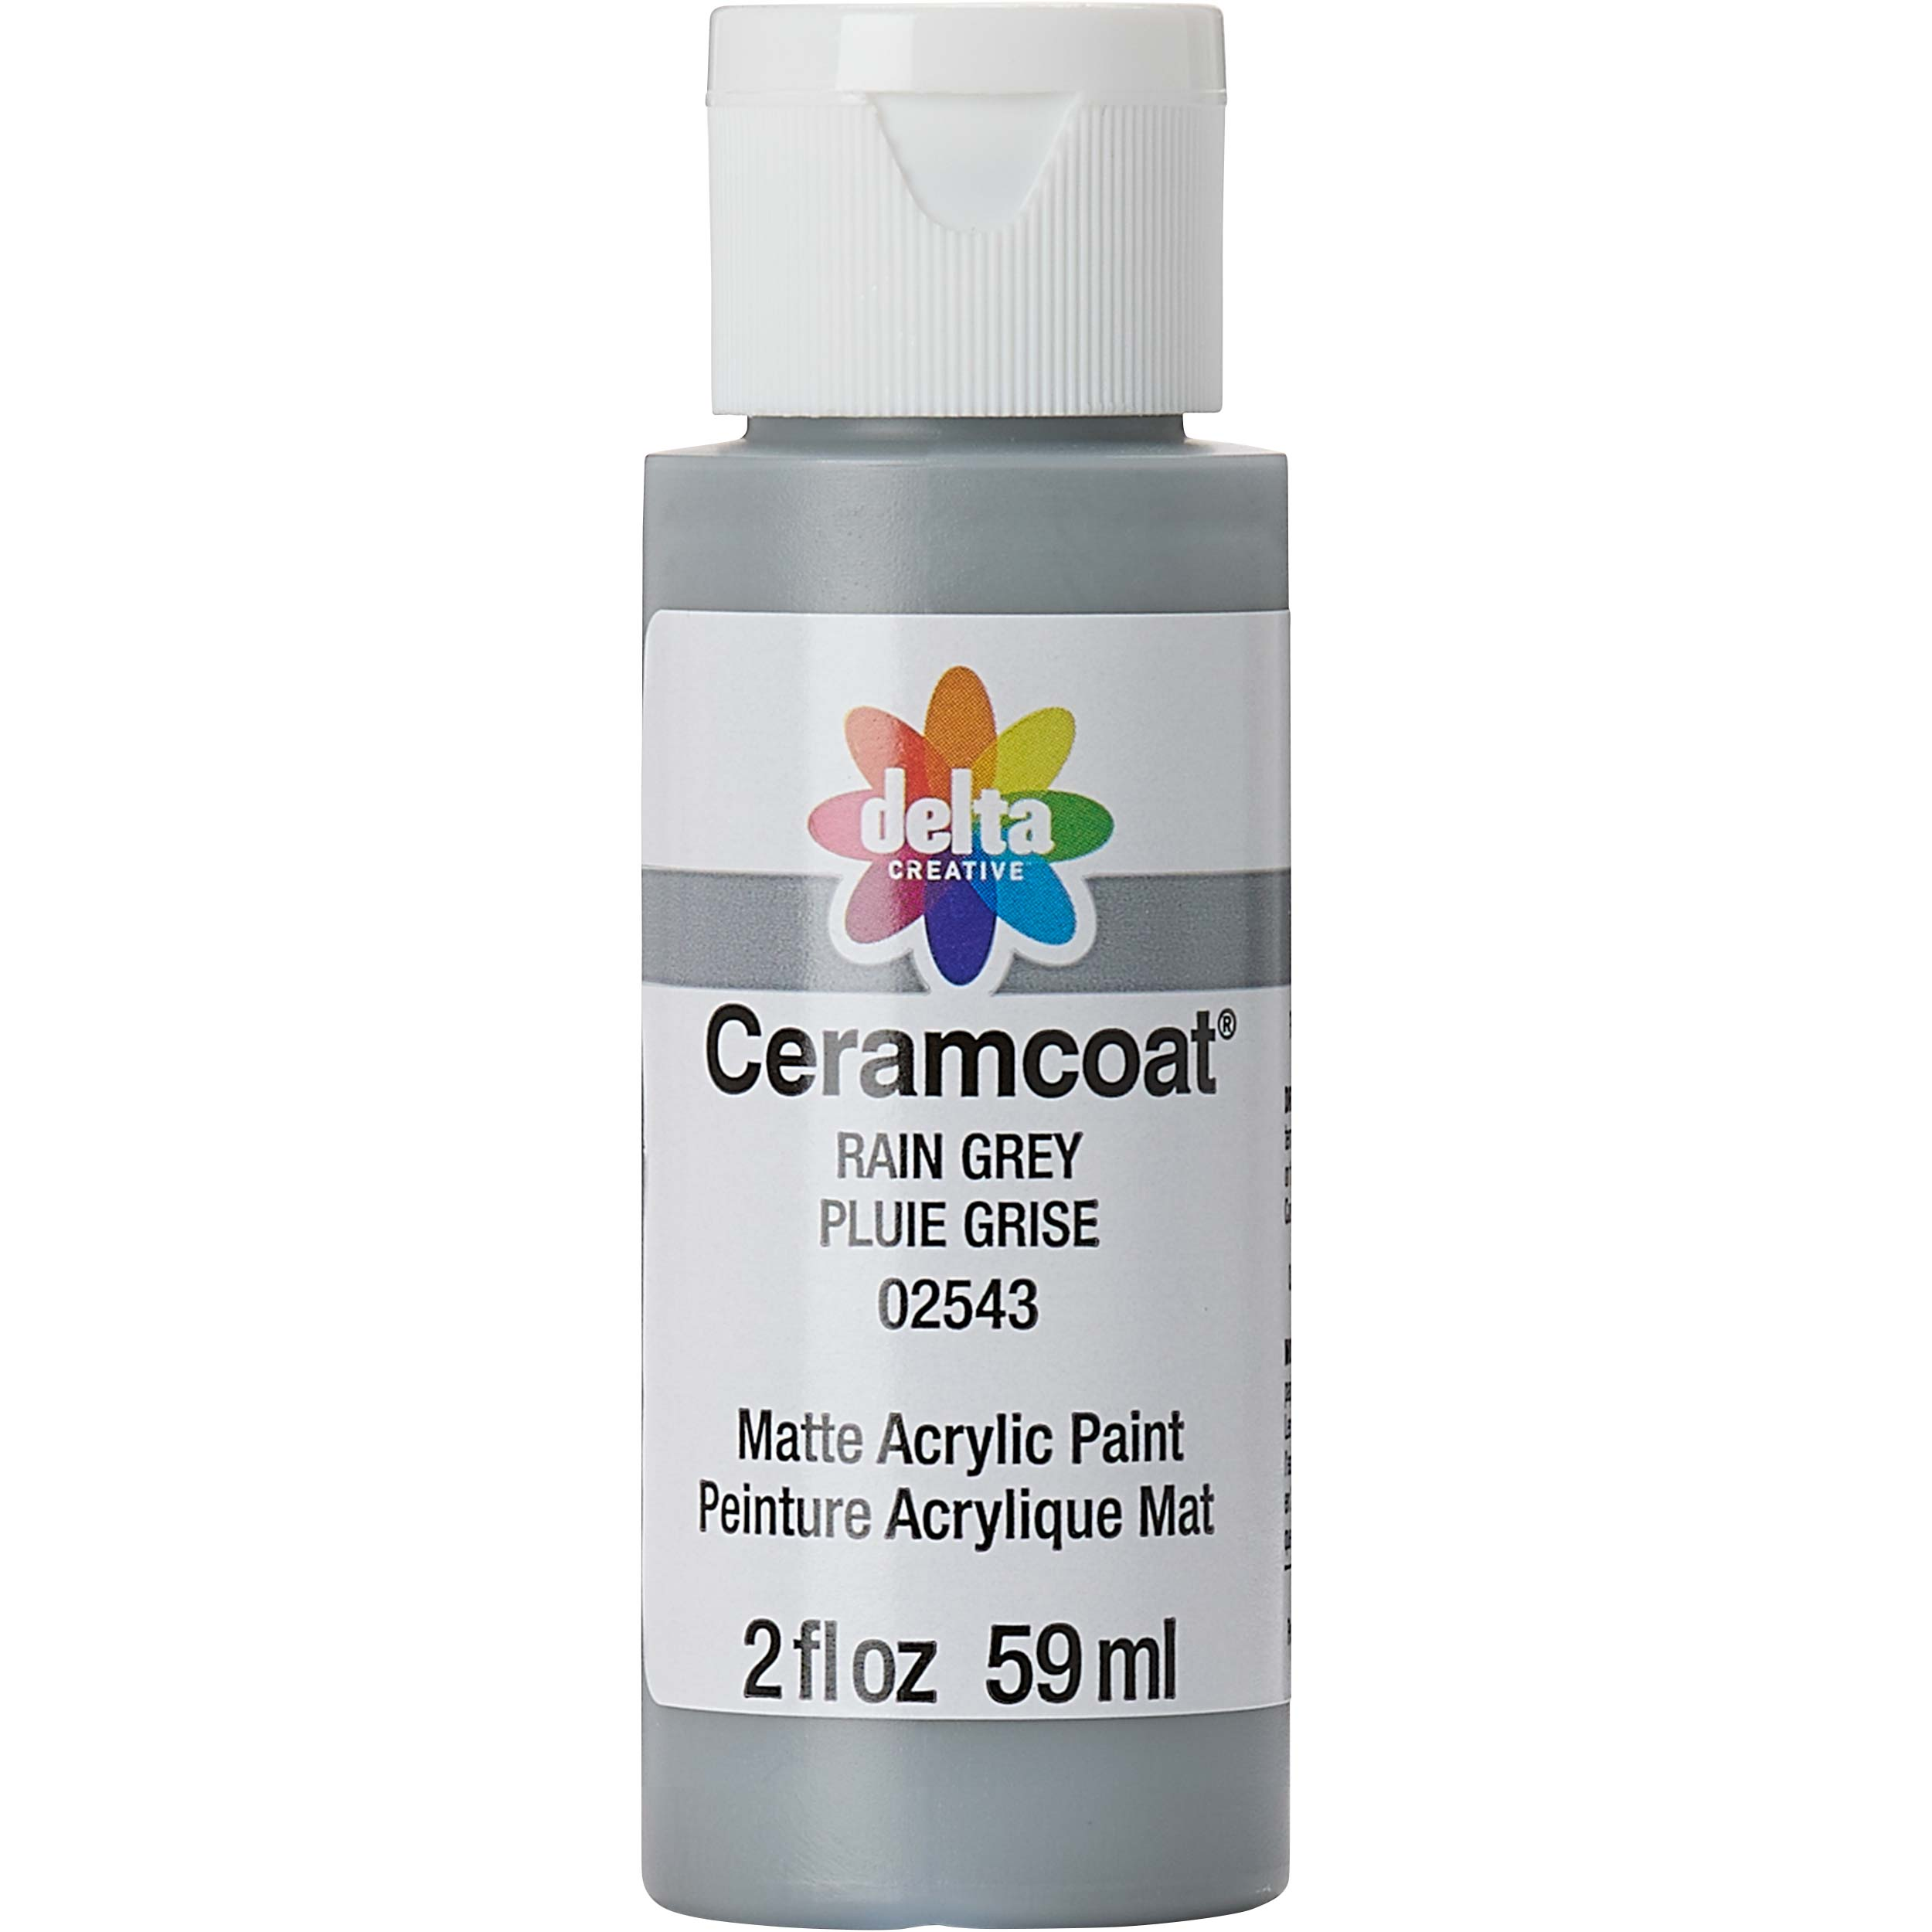 Delta Ceramcoat ® Acrylic Paint - Rain Grey, 2 oz. - 025430202W